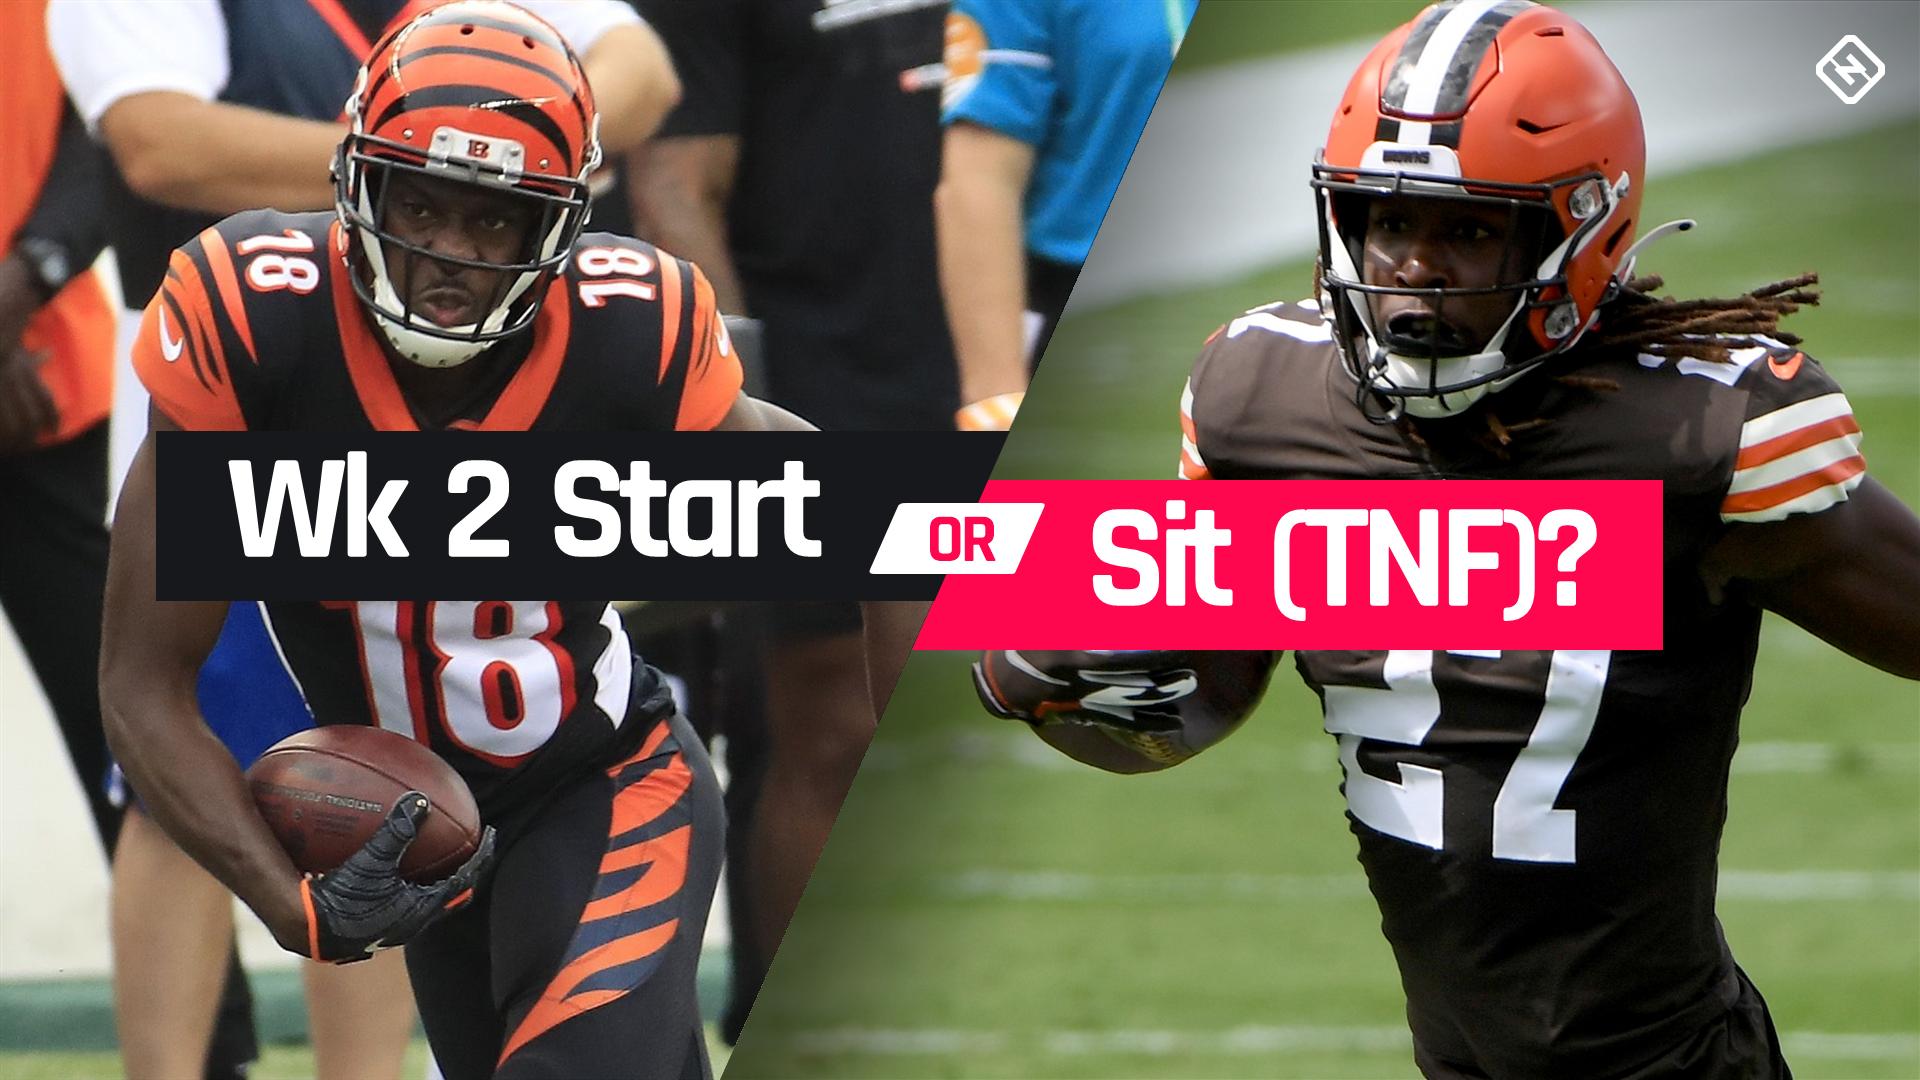 Bengals vs. Browns Fantasy Football Start 'Em Sit 'Em for Week 2 'Thursday Night Football'